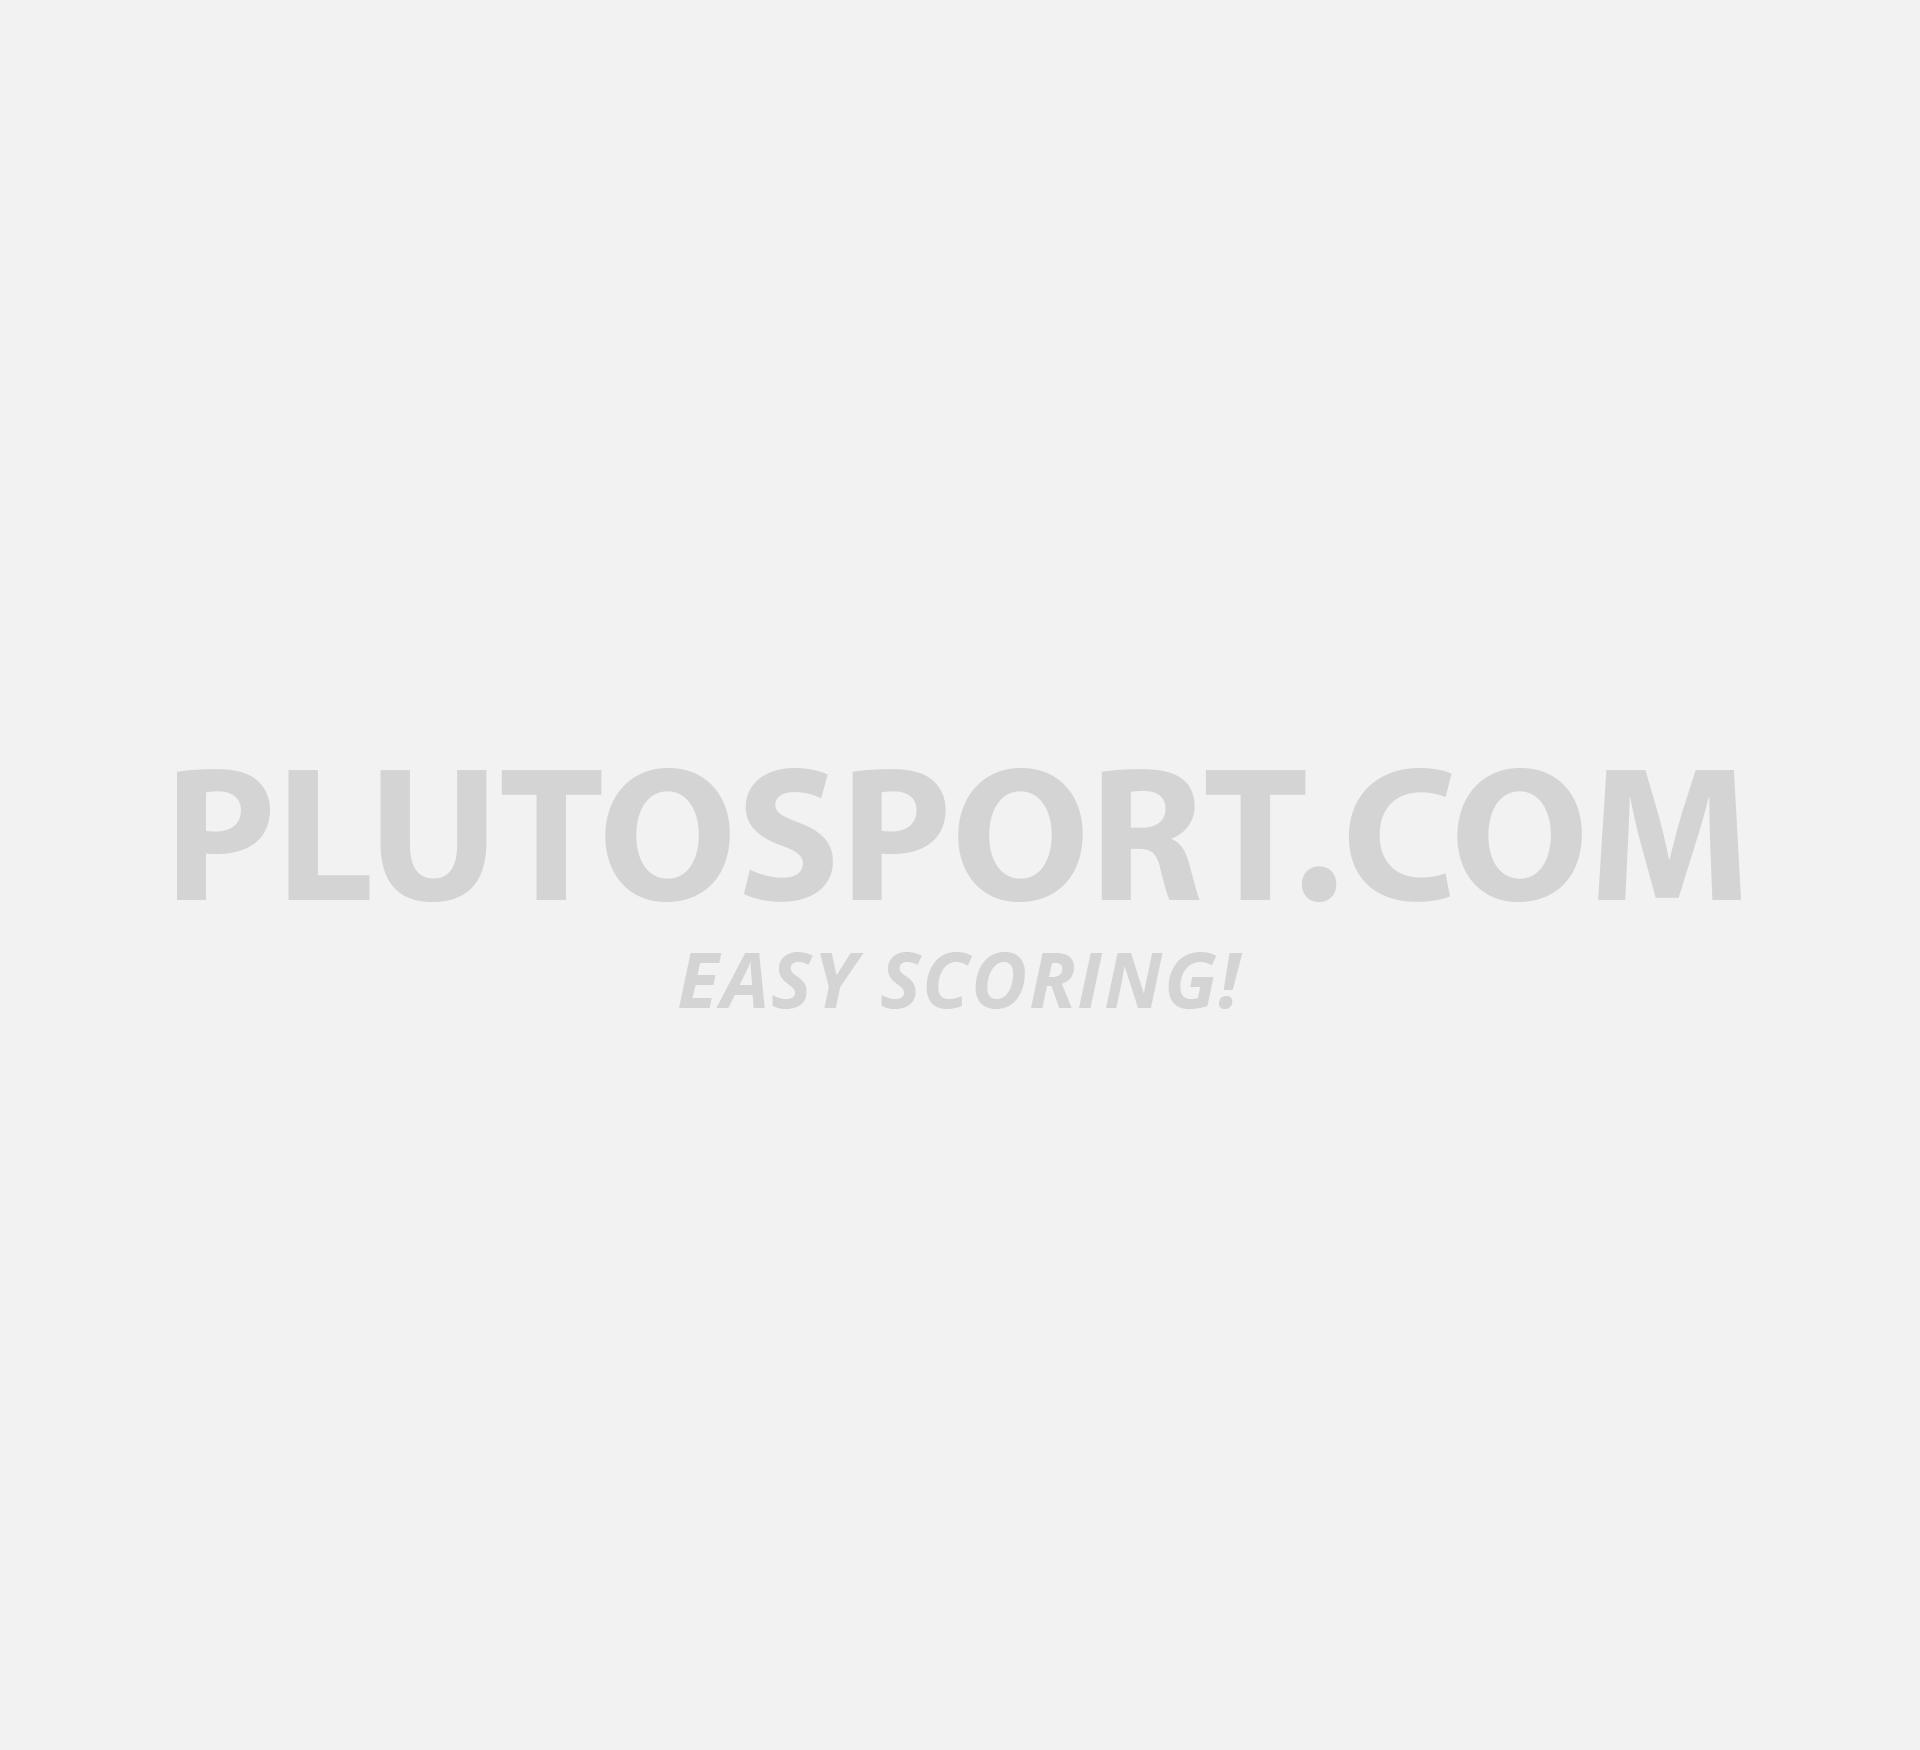 f982b4015db3 Puma Football TRG Poly Tracksuit Jr - Polyester - Tracksuits - Clothing -  Football - Sports